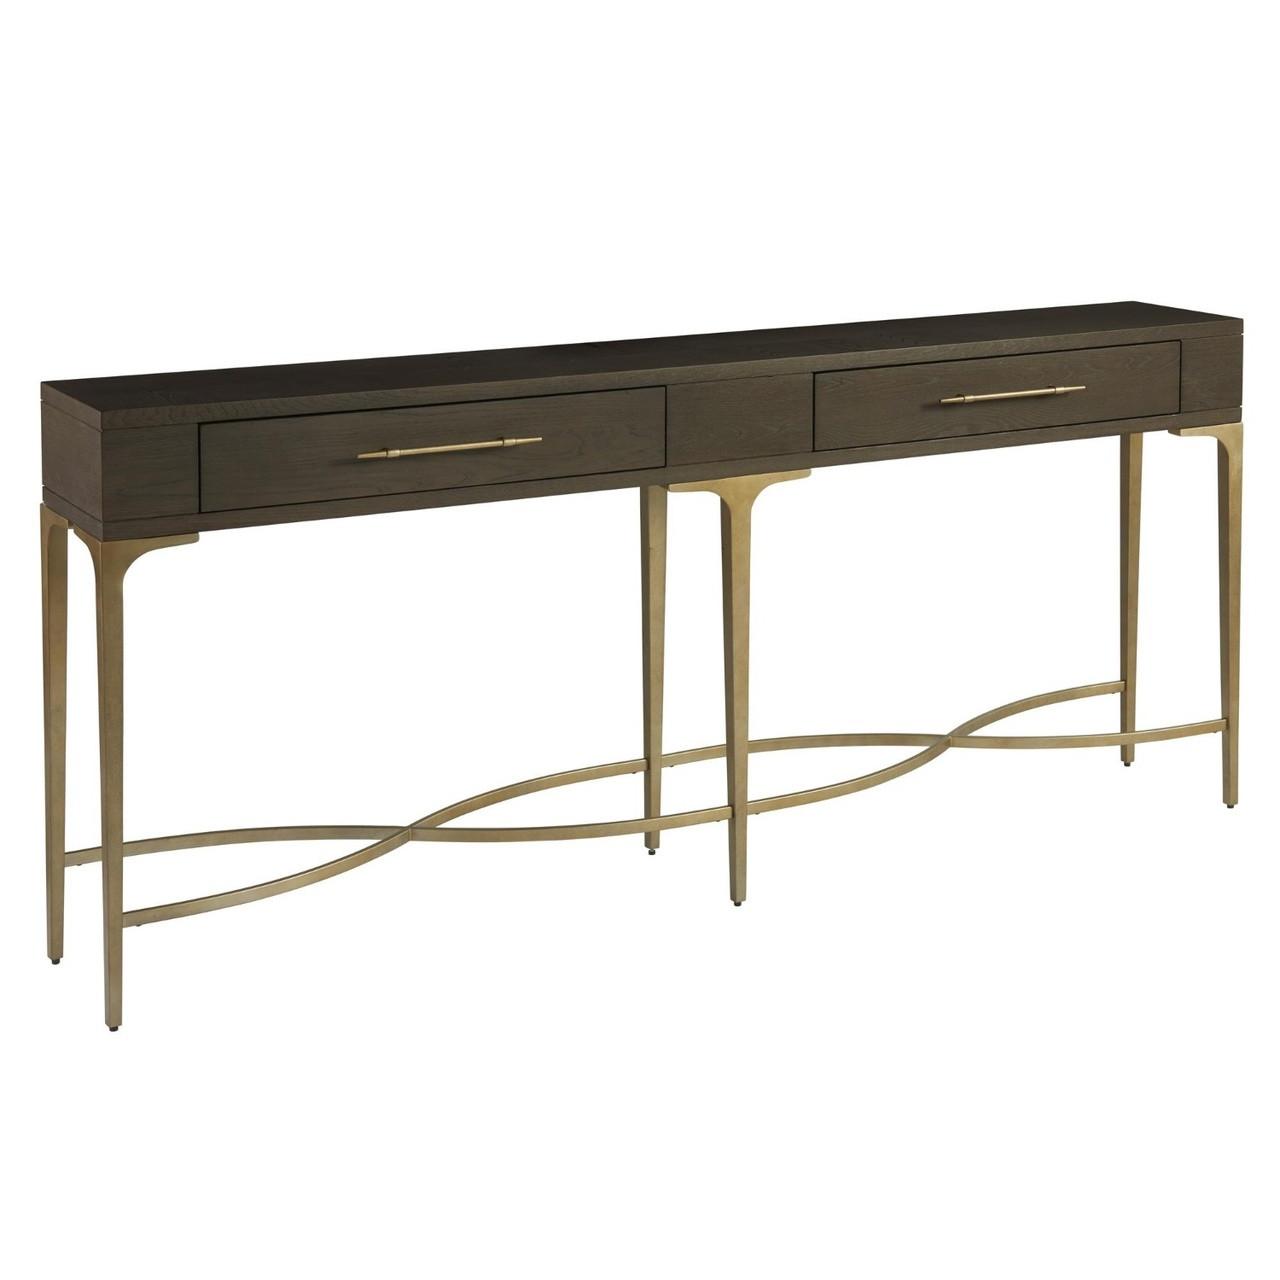 Soliloquy antiqued brass leg 2 drawer hall console table 80 zin home soliloquy antiqued brass leg 2 drawer hall console table 80 watchthetrailerfo